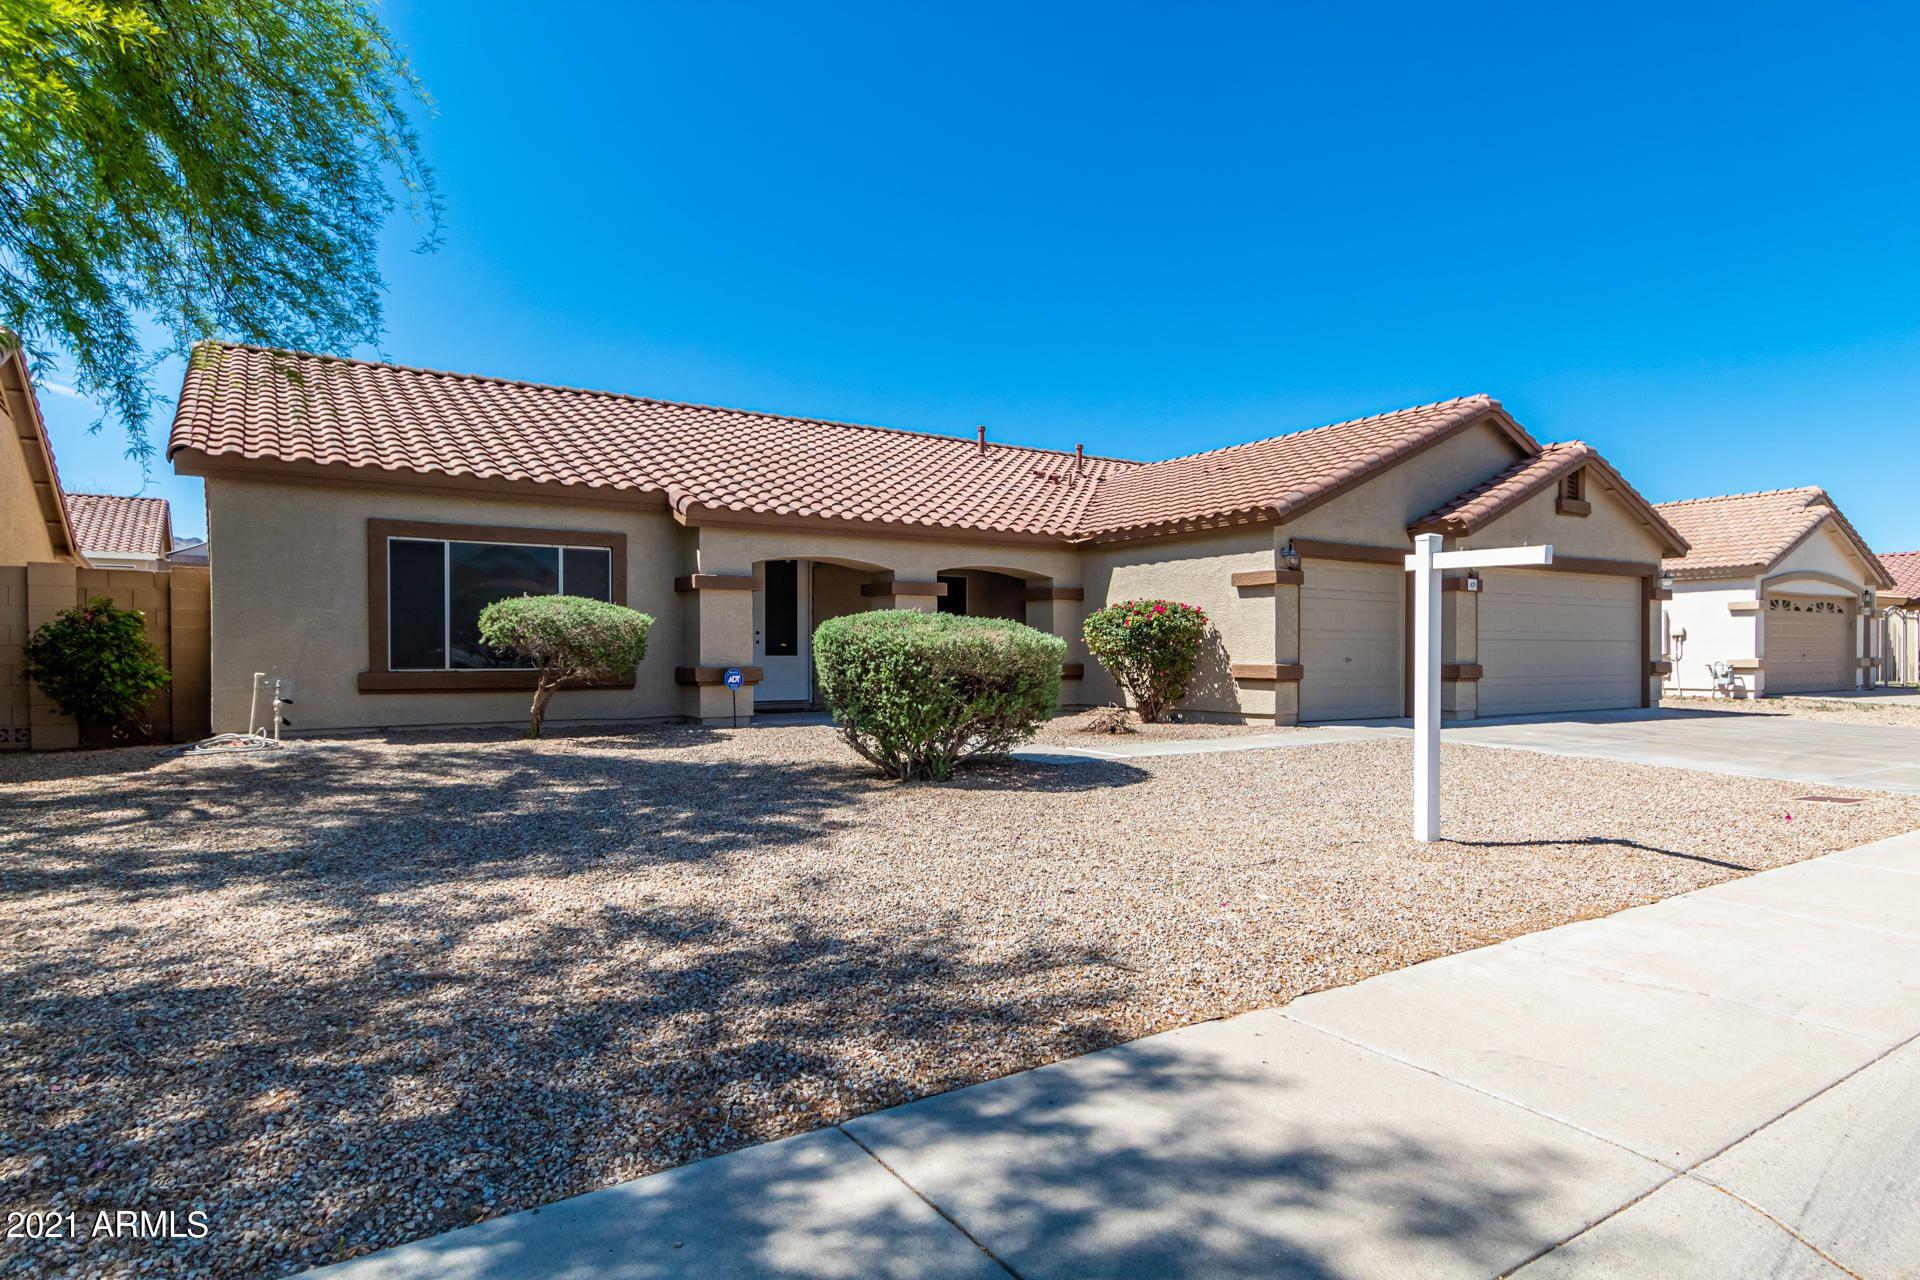 1429 E MALDONADO Drive, Phoenix, AZ 85042 - MLS#: 6217774